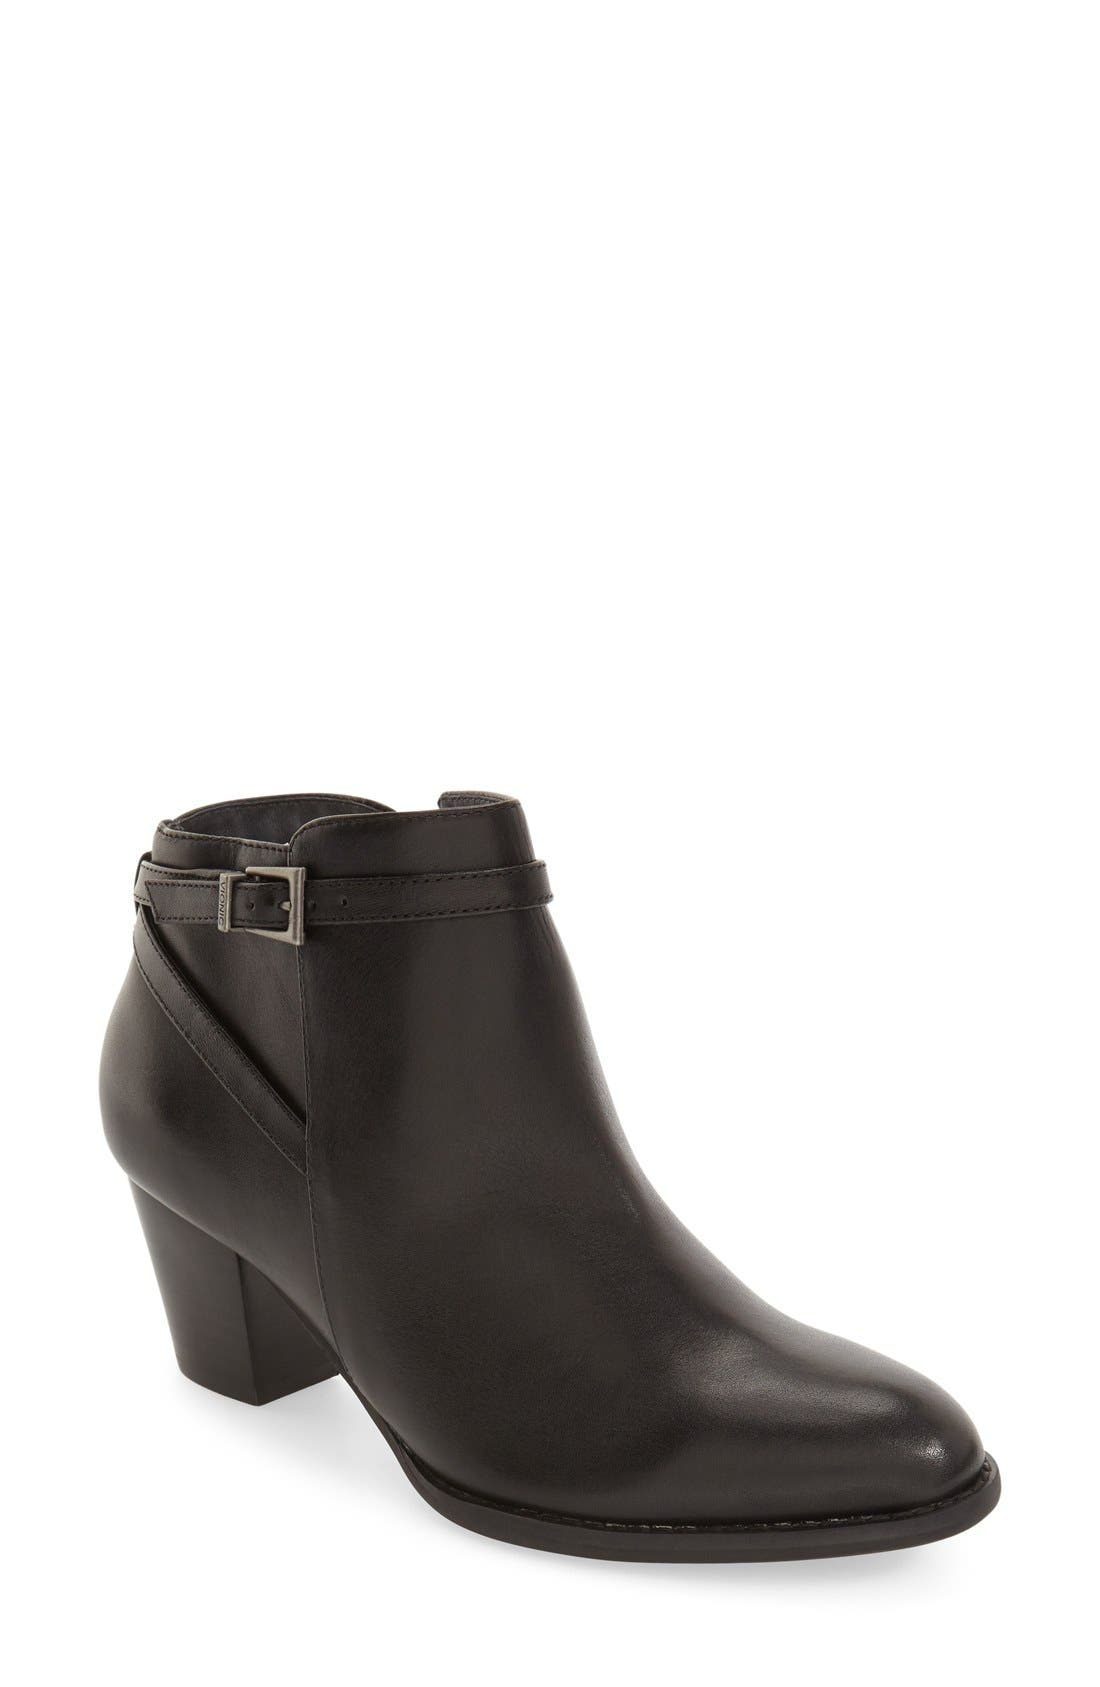 'Upton' Block Heel Boot,                         Main,                         color, Black Leather